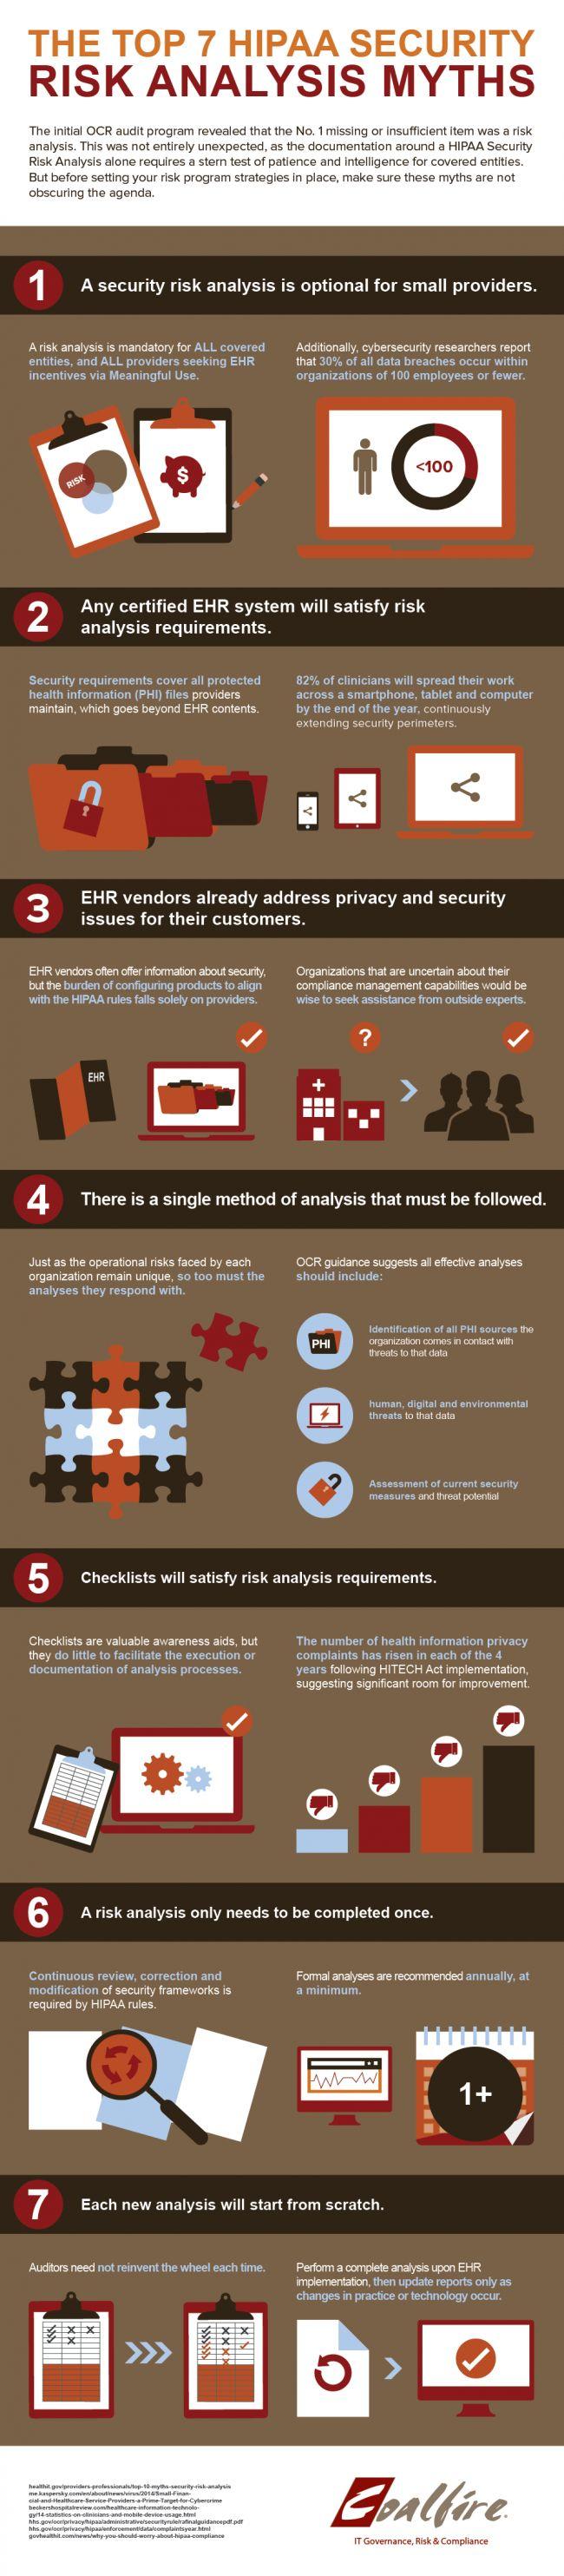 The top 7 #HIPAA security risk analysis myths: http://www.tykans.com